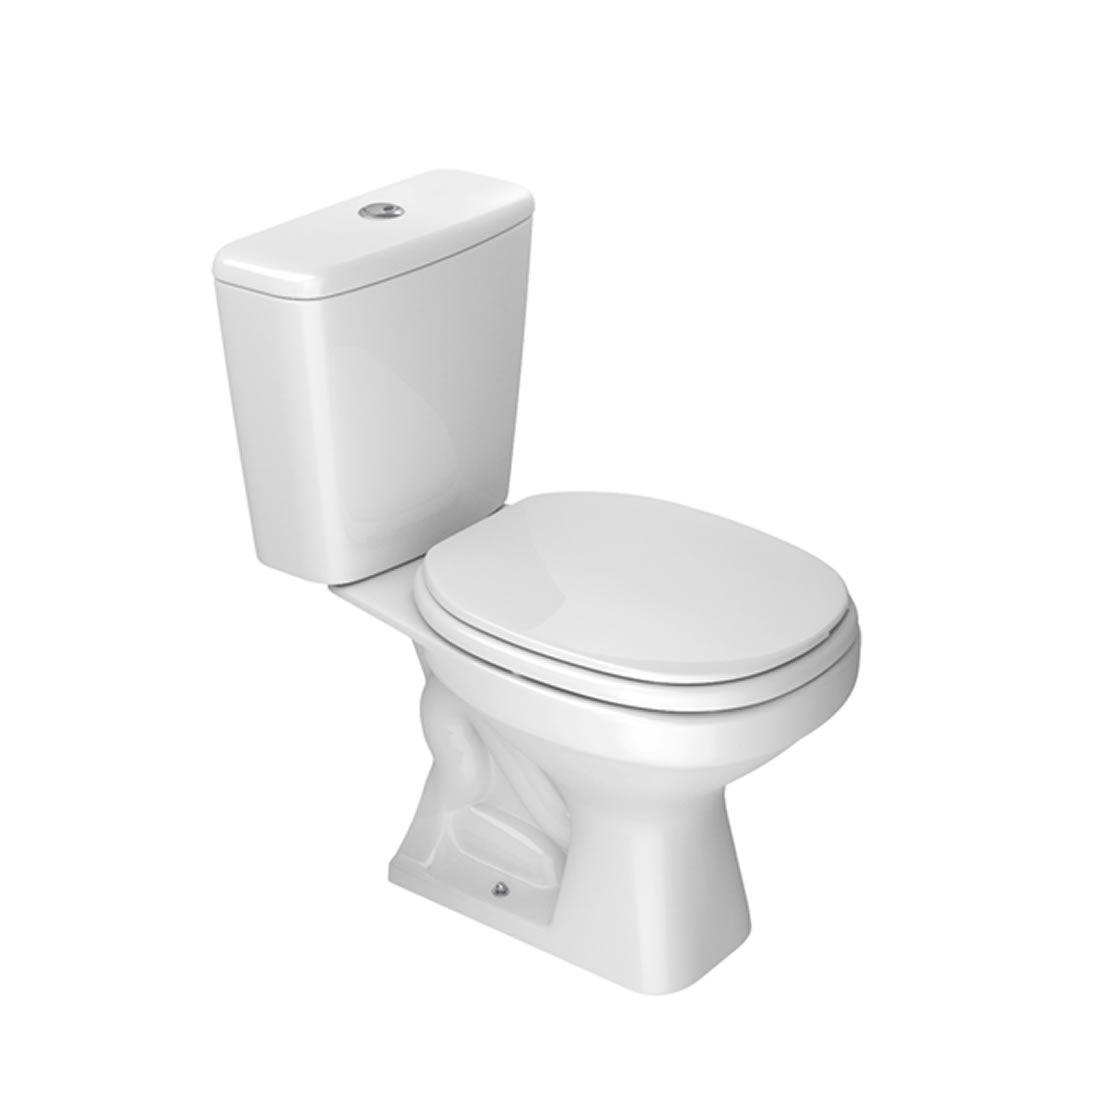 Kit Vaso Sanitário com Caixa Acoplada Aspen Branco Deca